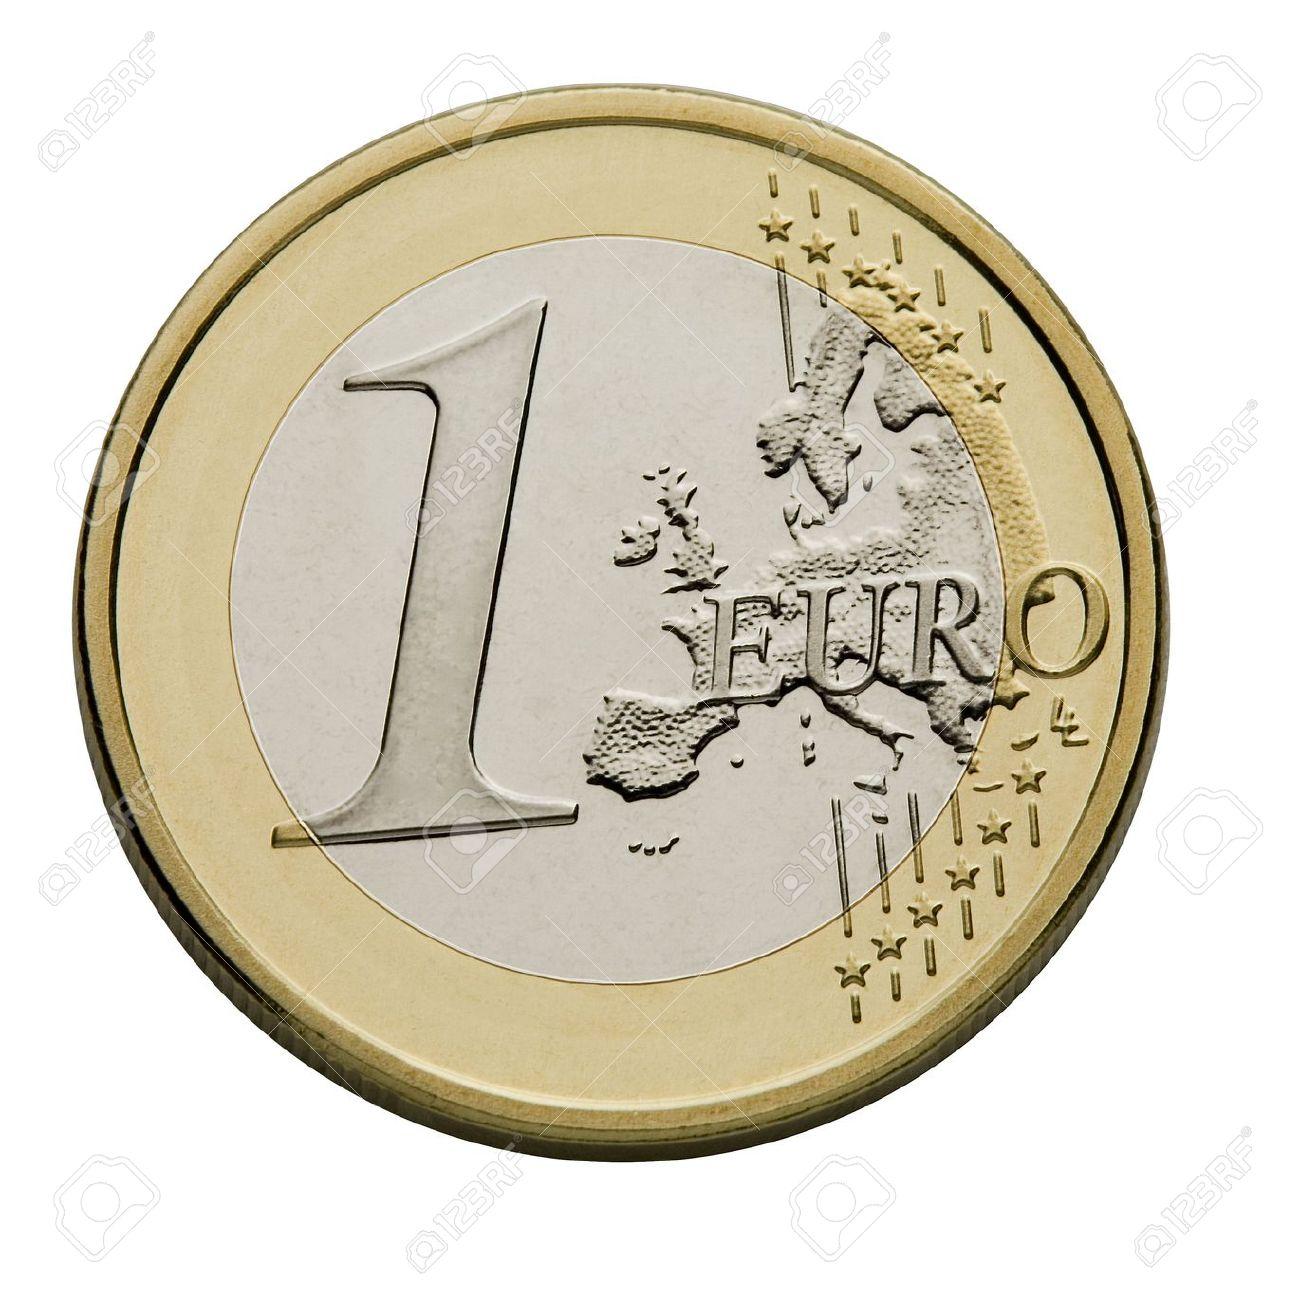 Image result for European 1 Union: Euro